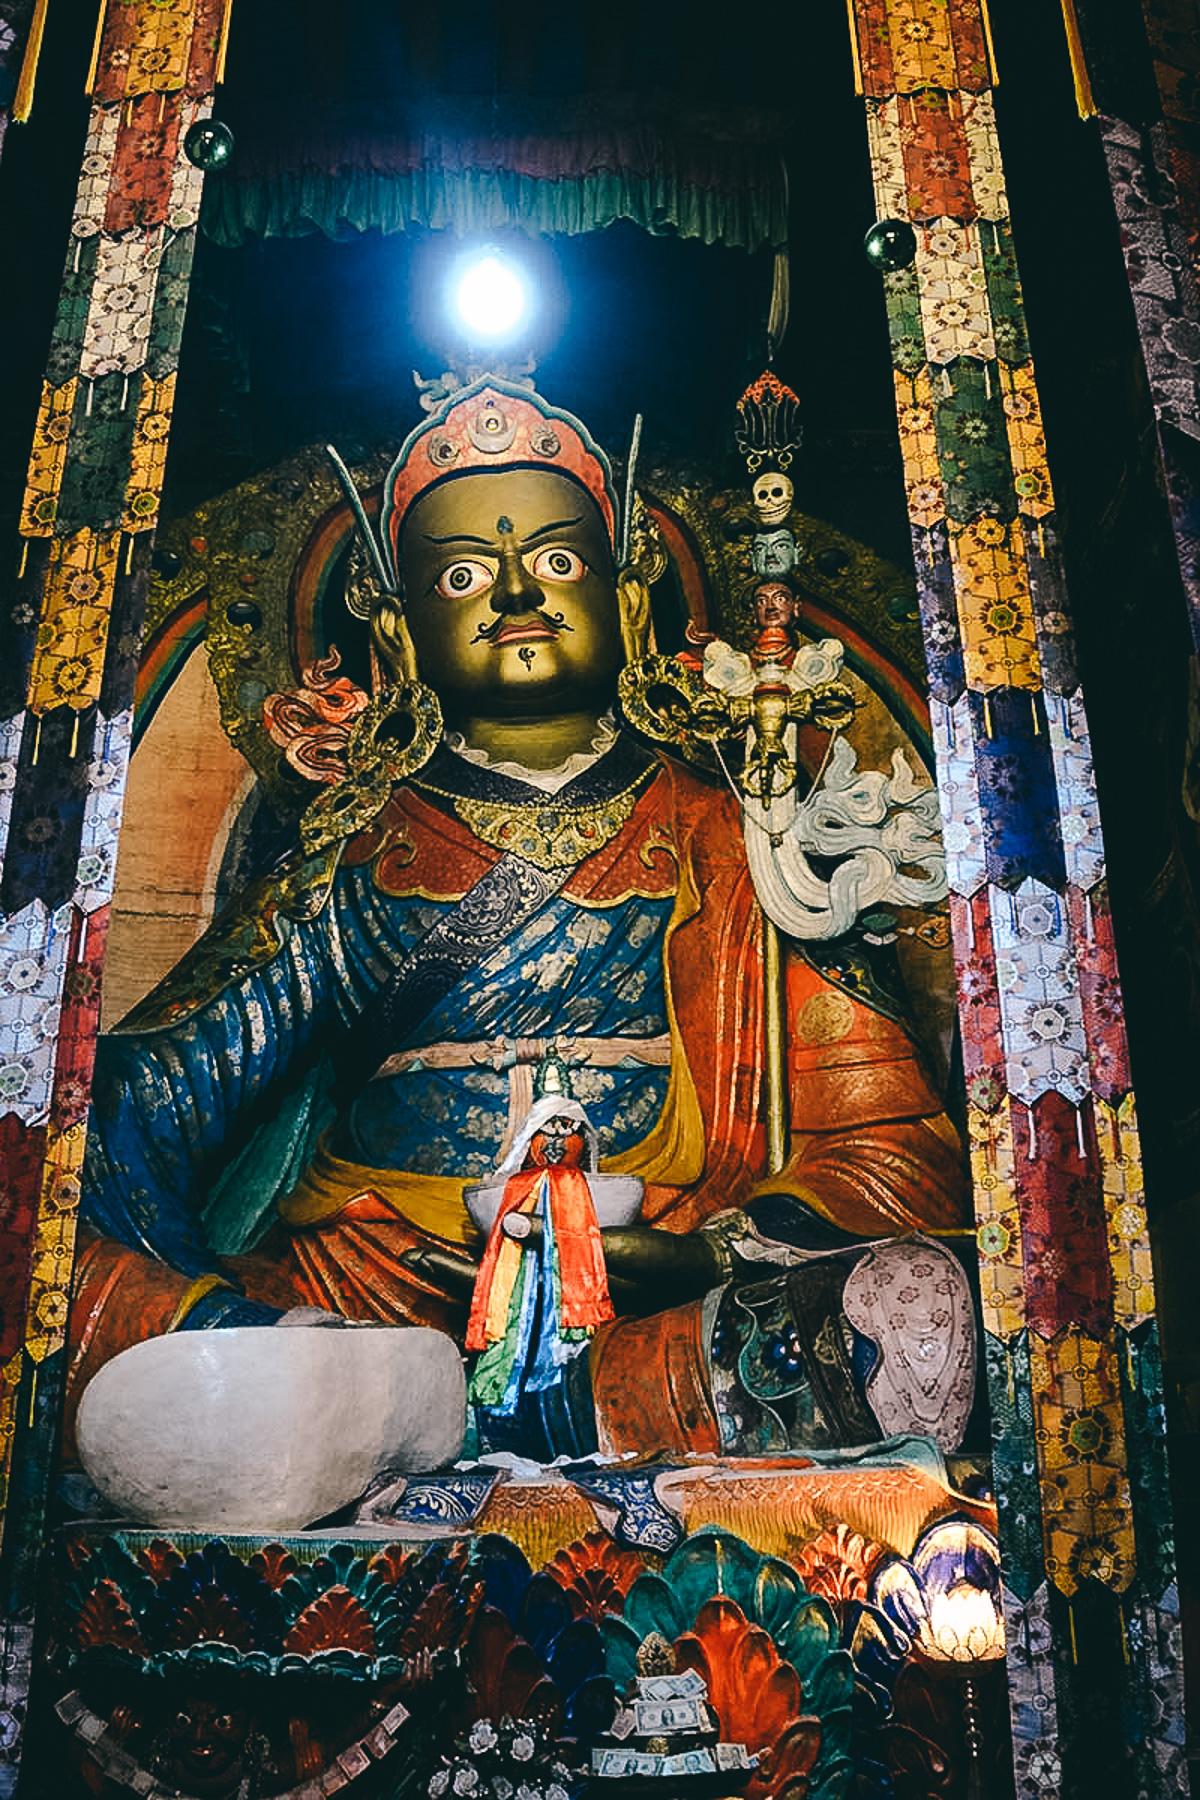 statue von Padmasambhava im Hemis-Kloster